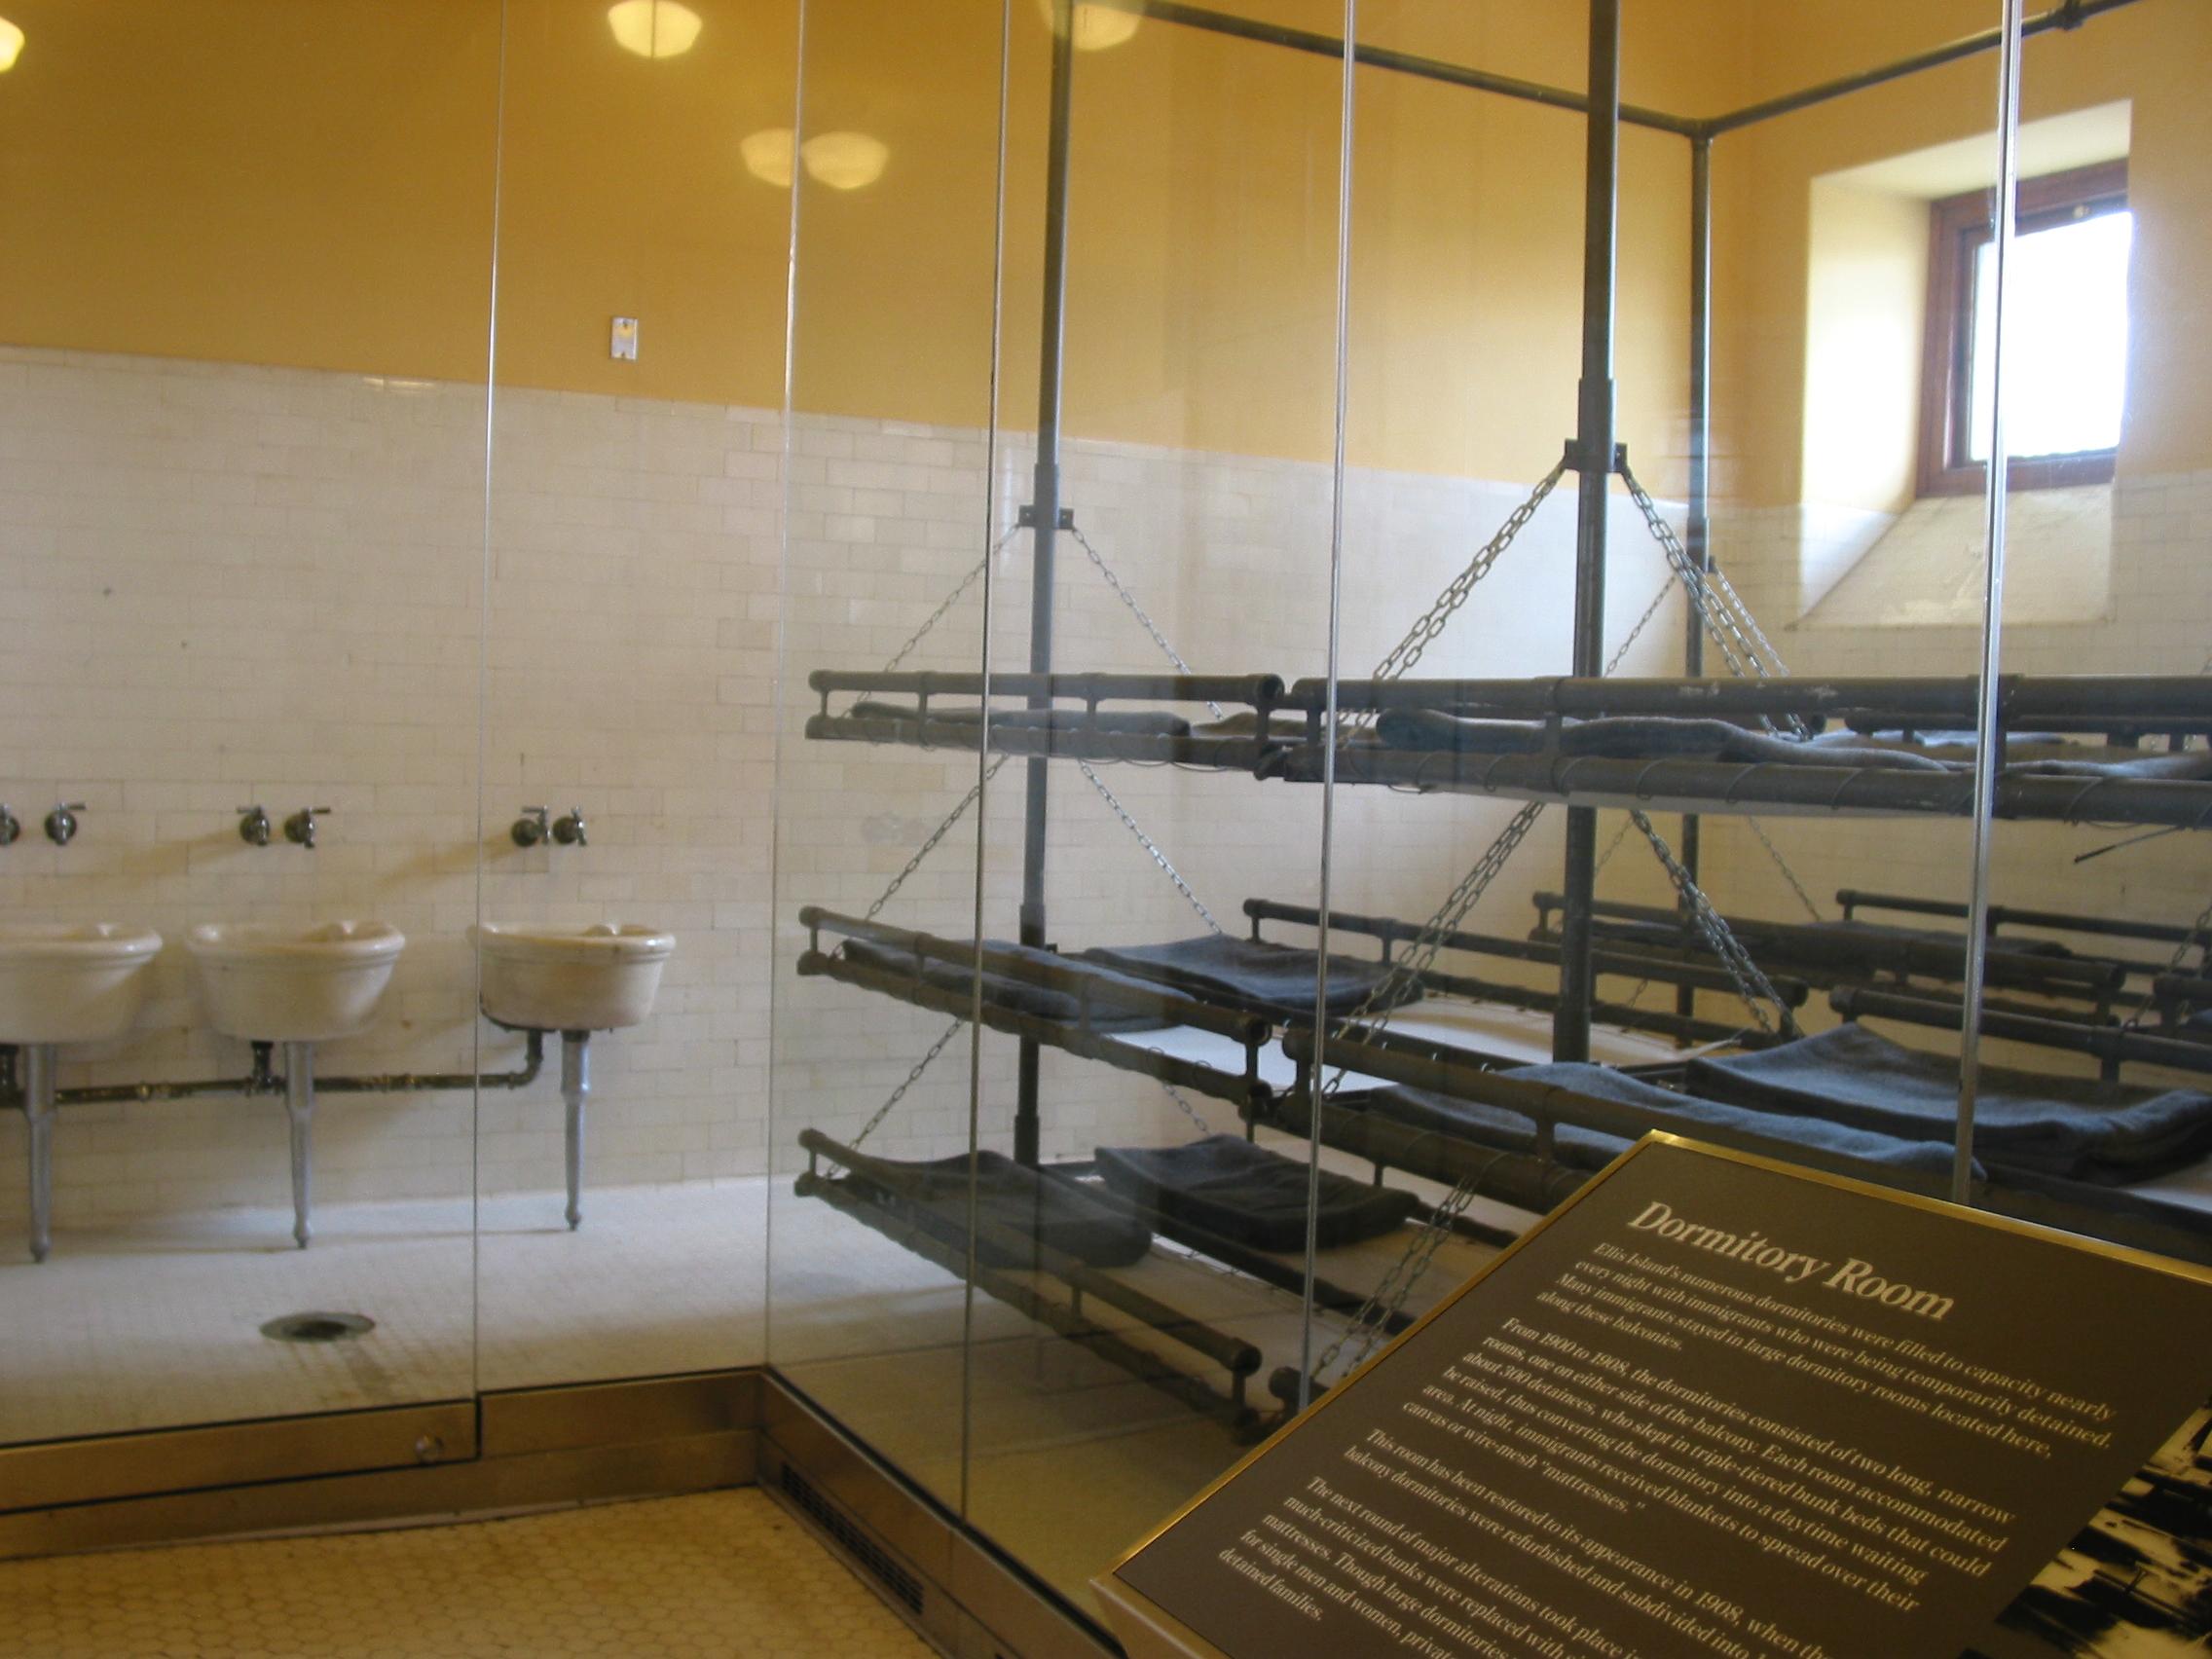 Ellis Island dormitory room.JPG